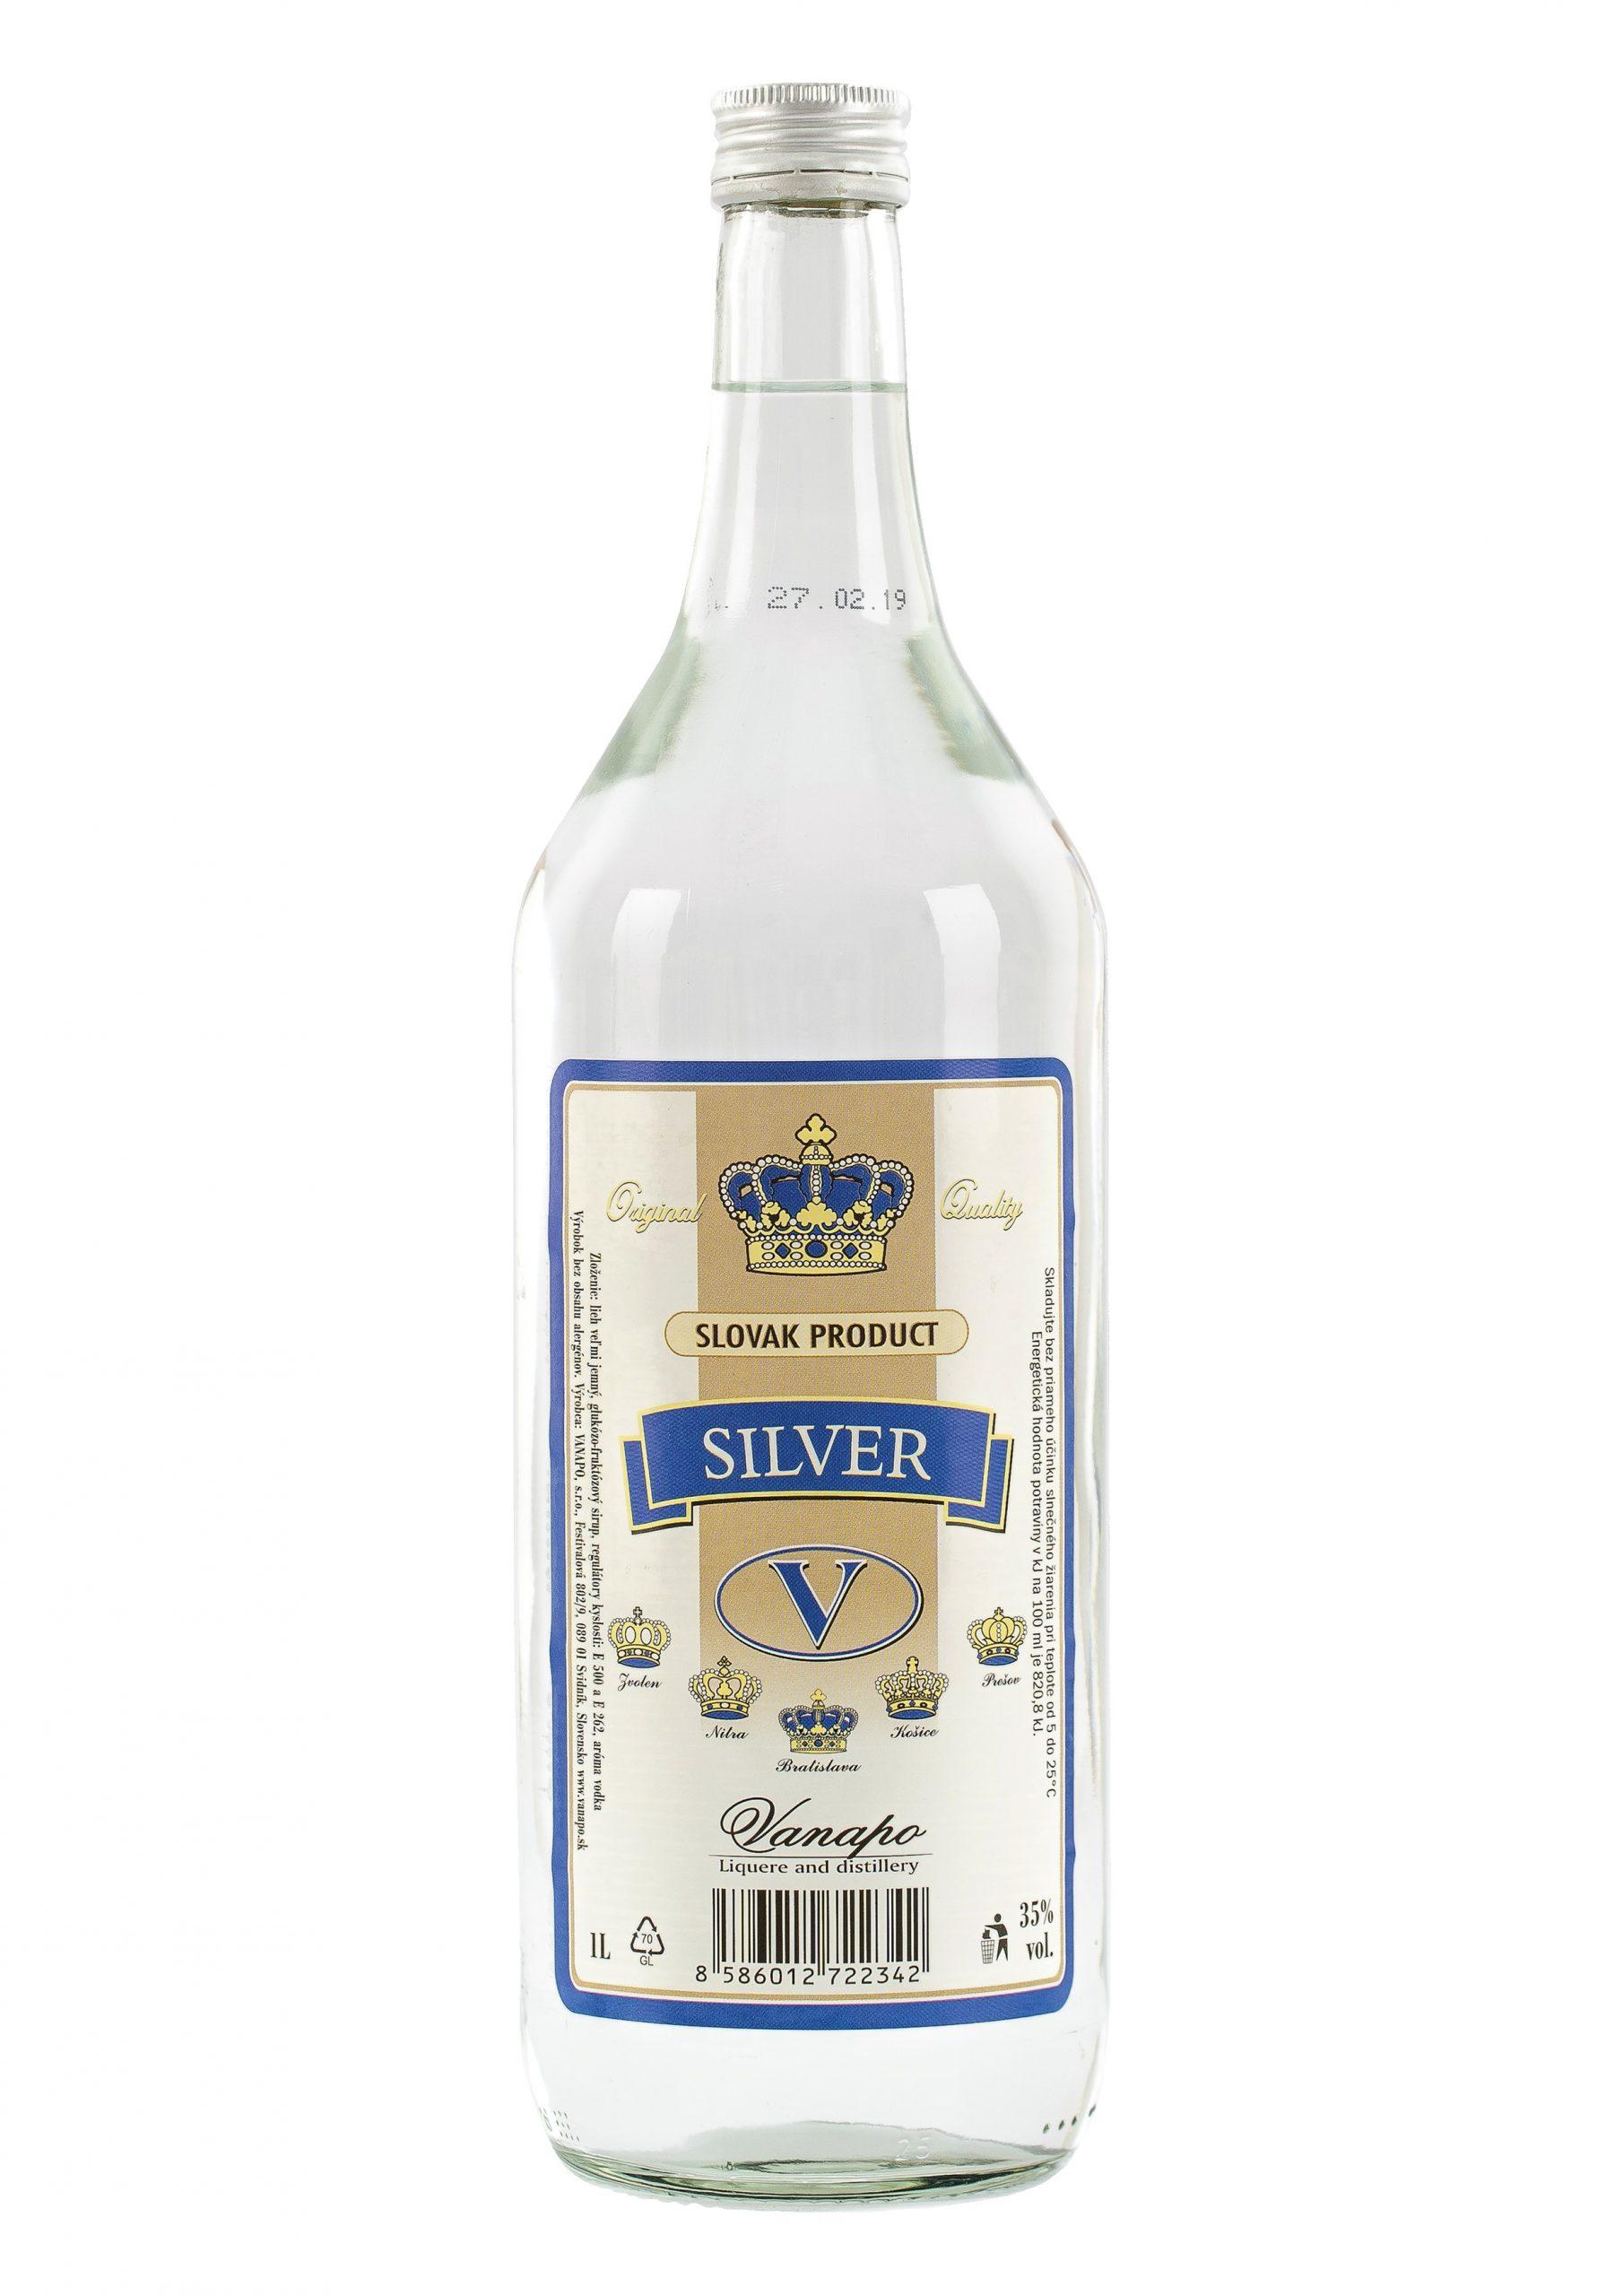 Vodka Silver 35 1L scaled 1 - Silver V